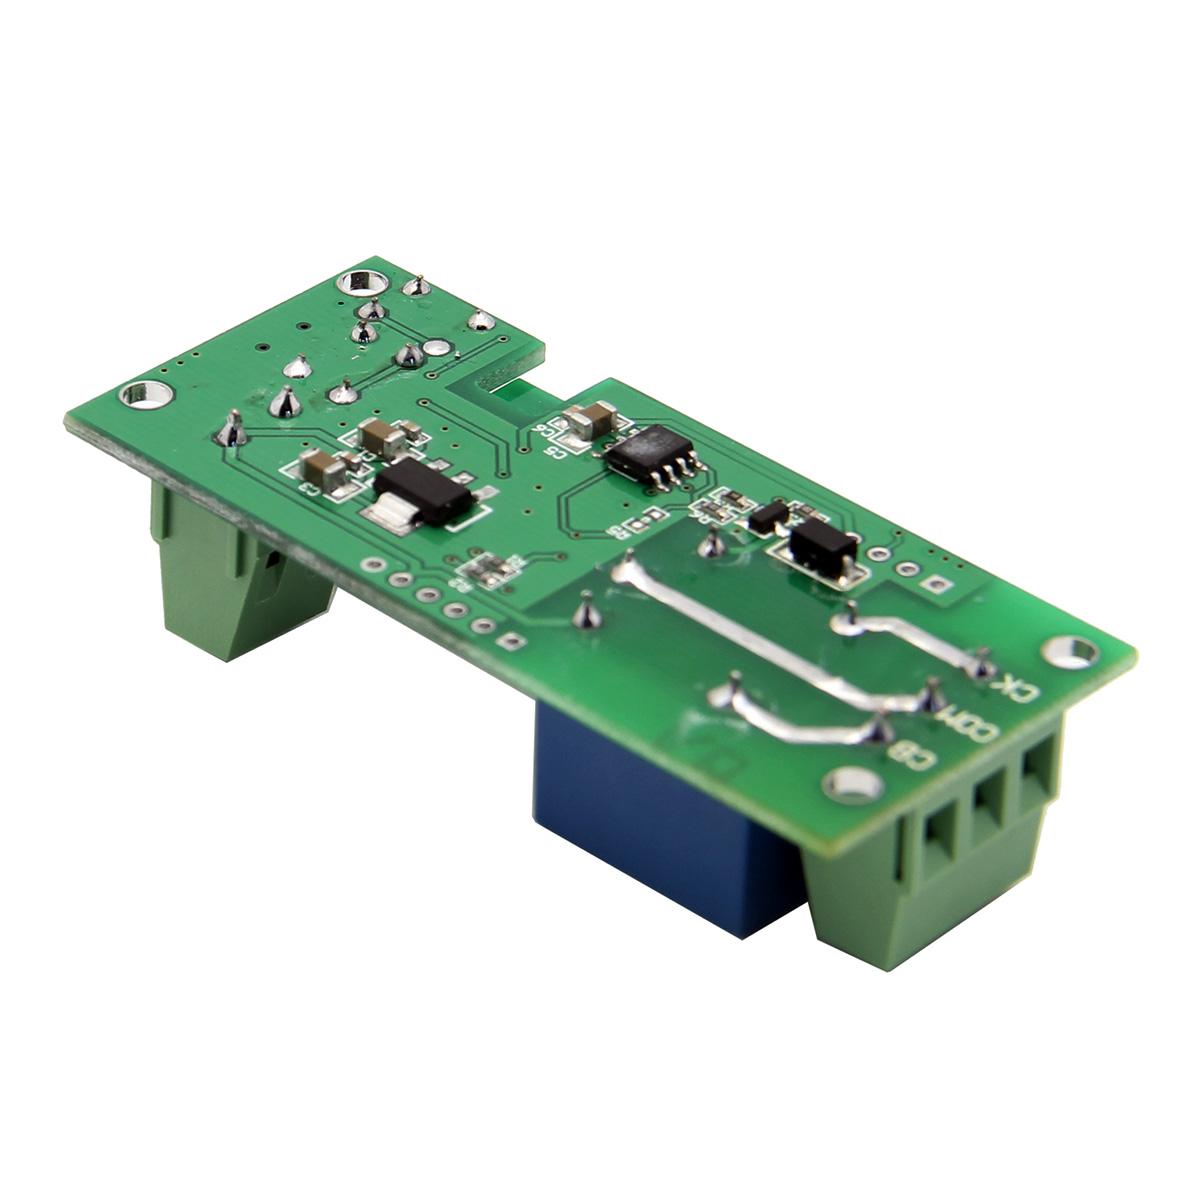 USB 5V DIY One Channel Jog Inching Self-locking WIFI Wireless Smart Home  Switch